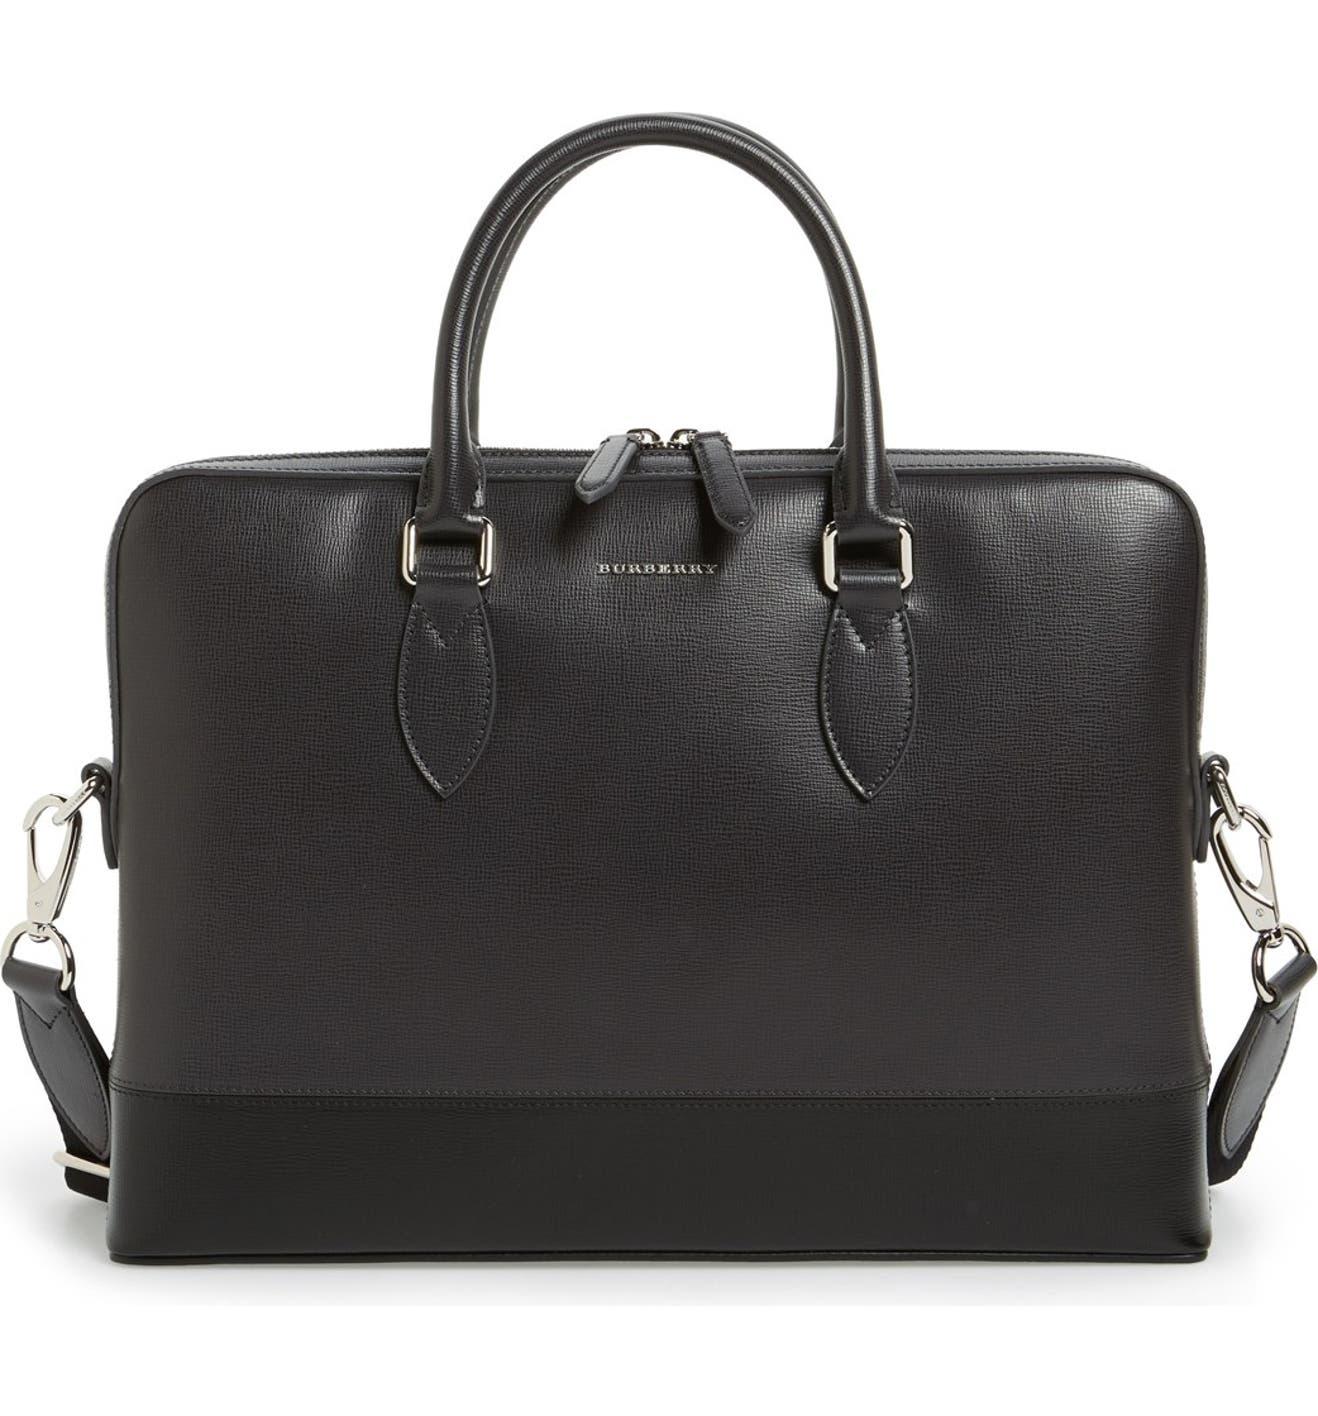 Burberry The Barrow Leather Briefcase  385982ace0d2c